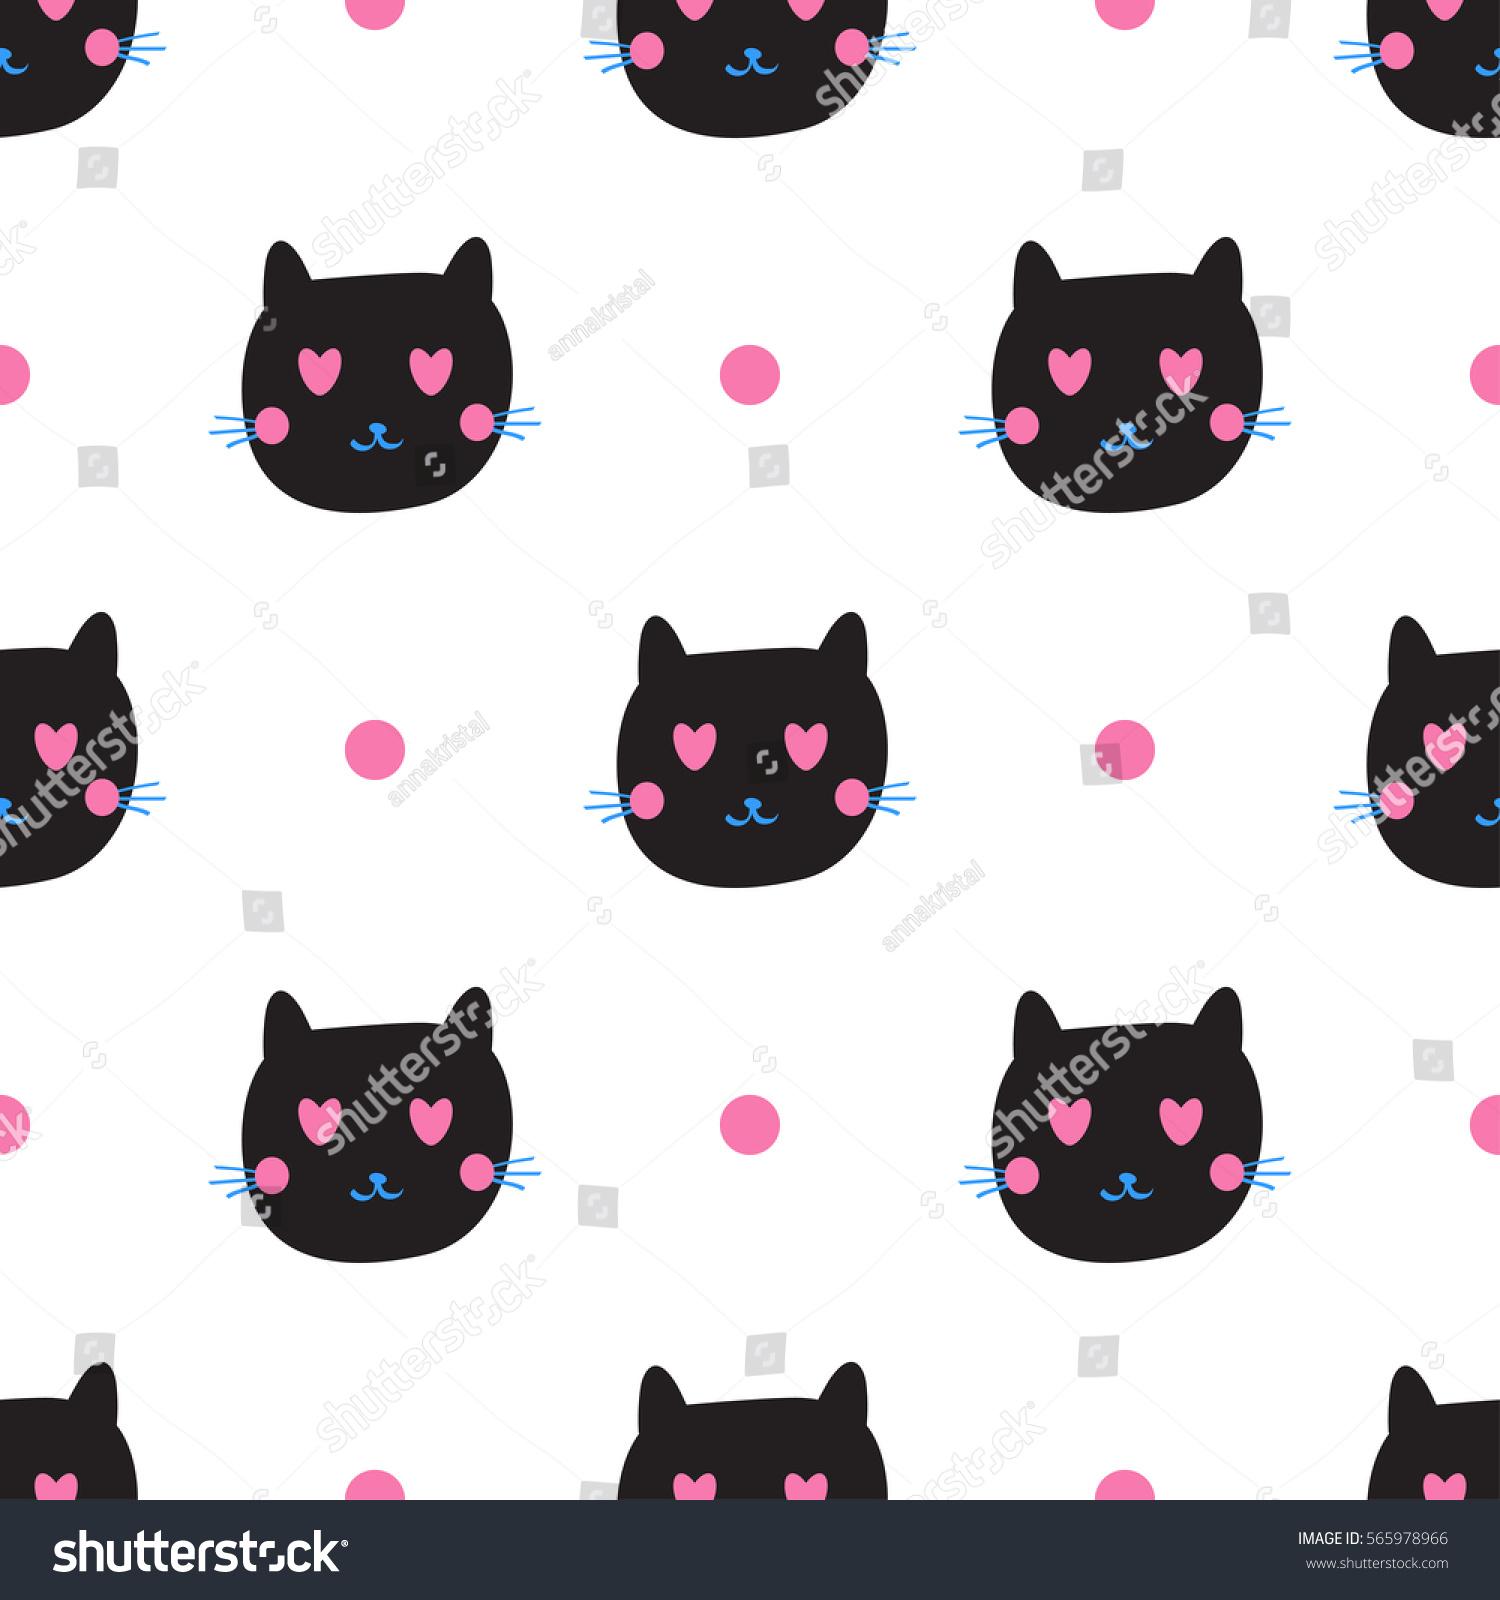 Cute Black Cat Emotions Seamless Pattern Stock Vector 565978966 ...